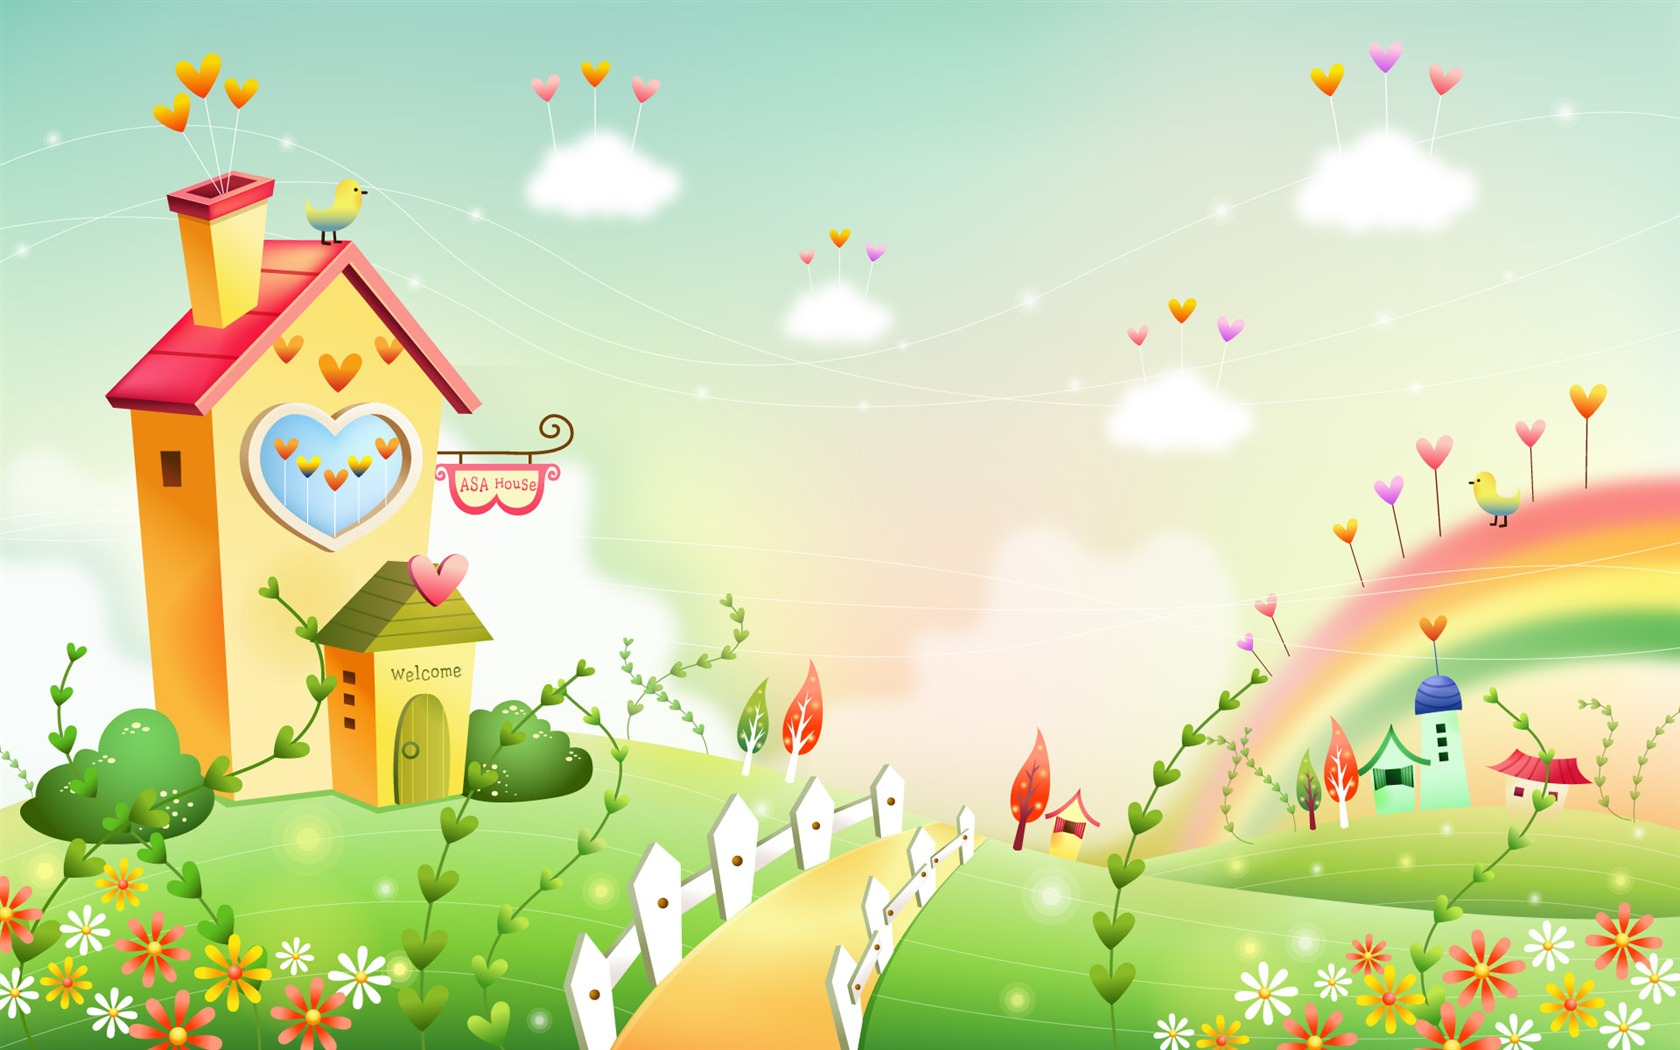 Cartoon fantasy scenery wallpapers 19 1680x1050 for Wallpaper home cartoon